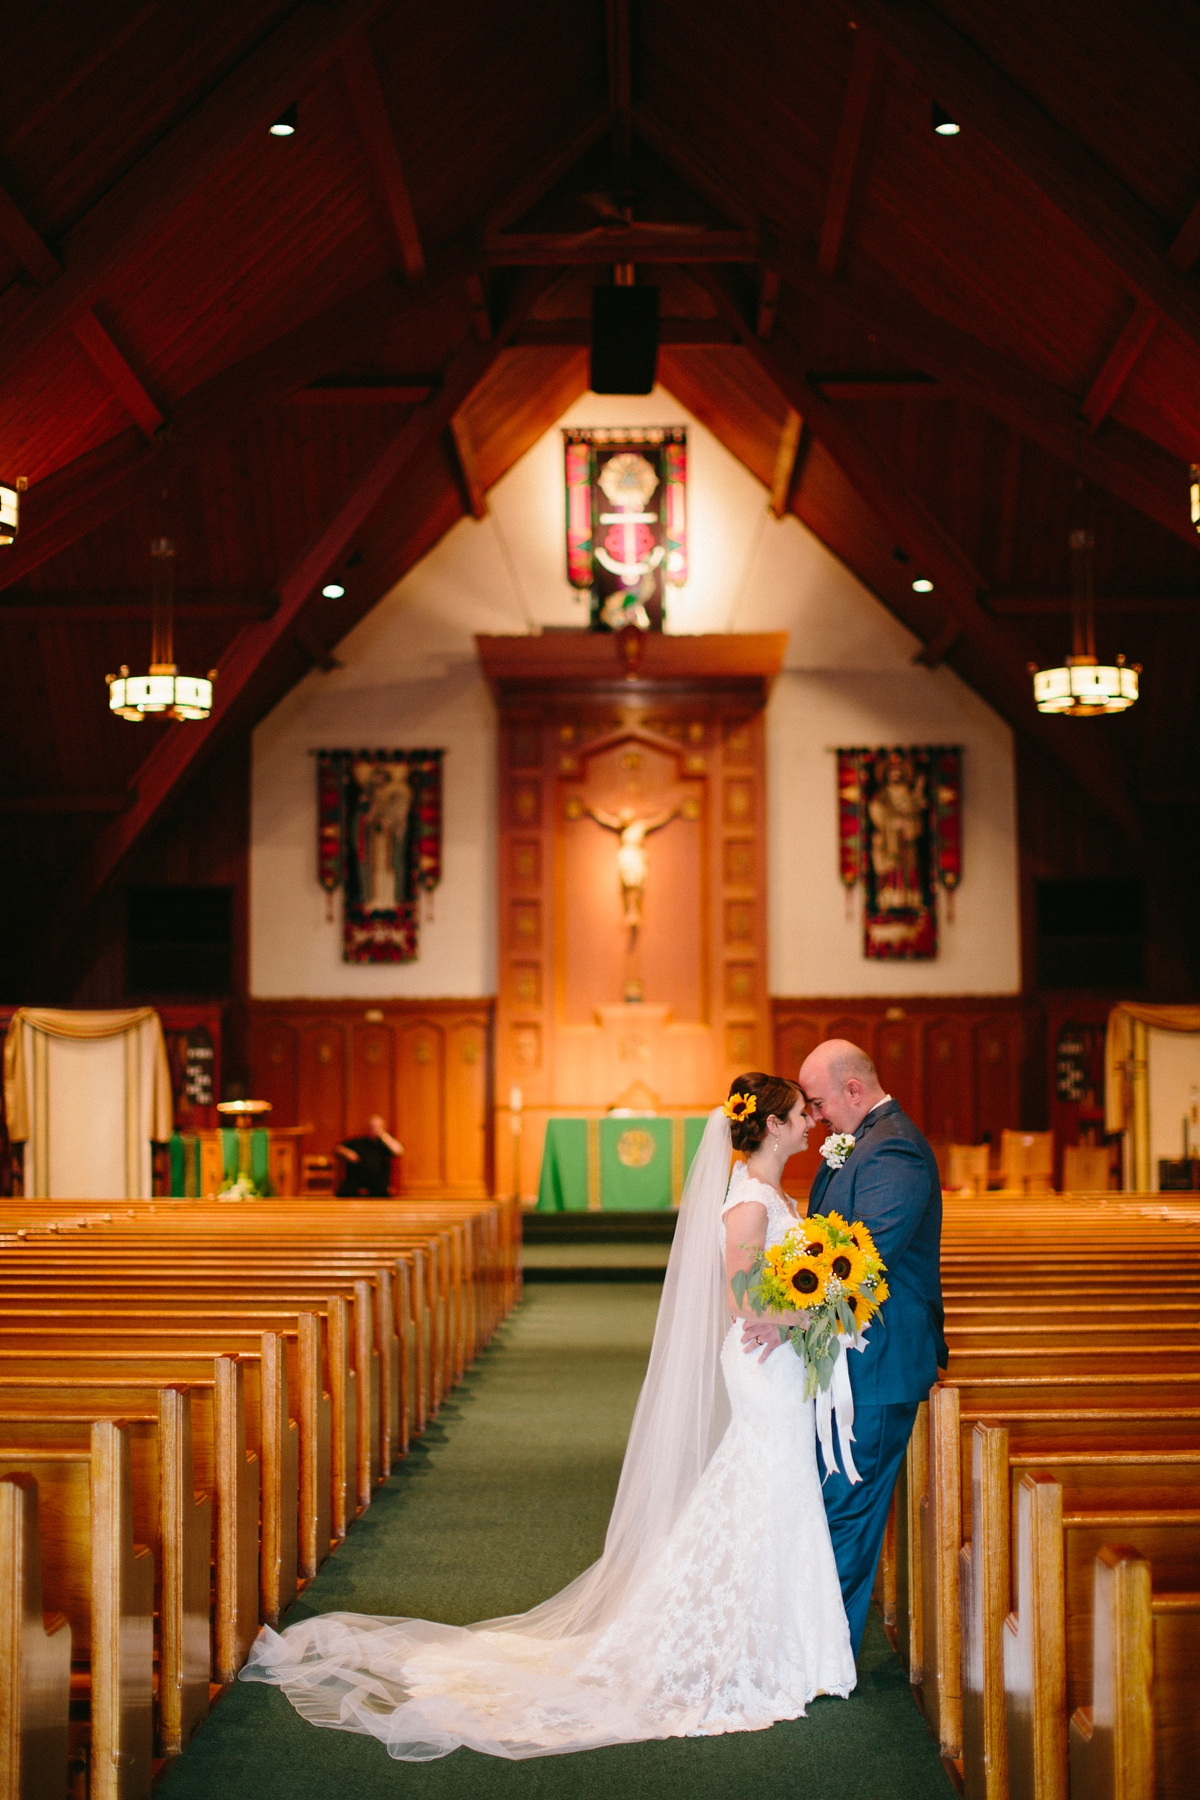 destination_wedding_photographer_estate_engagement_session_0025.jpg